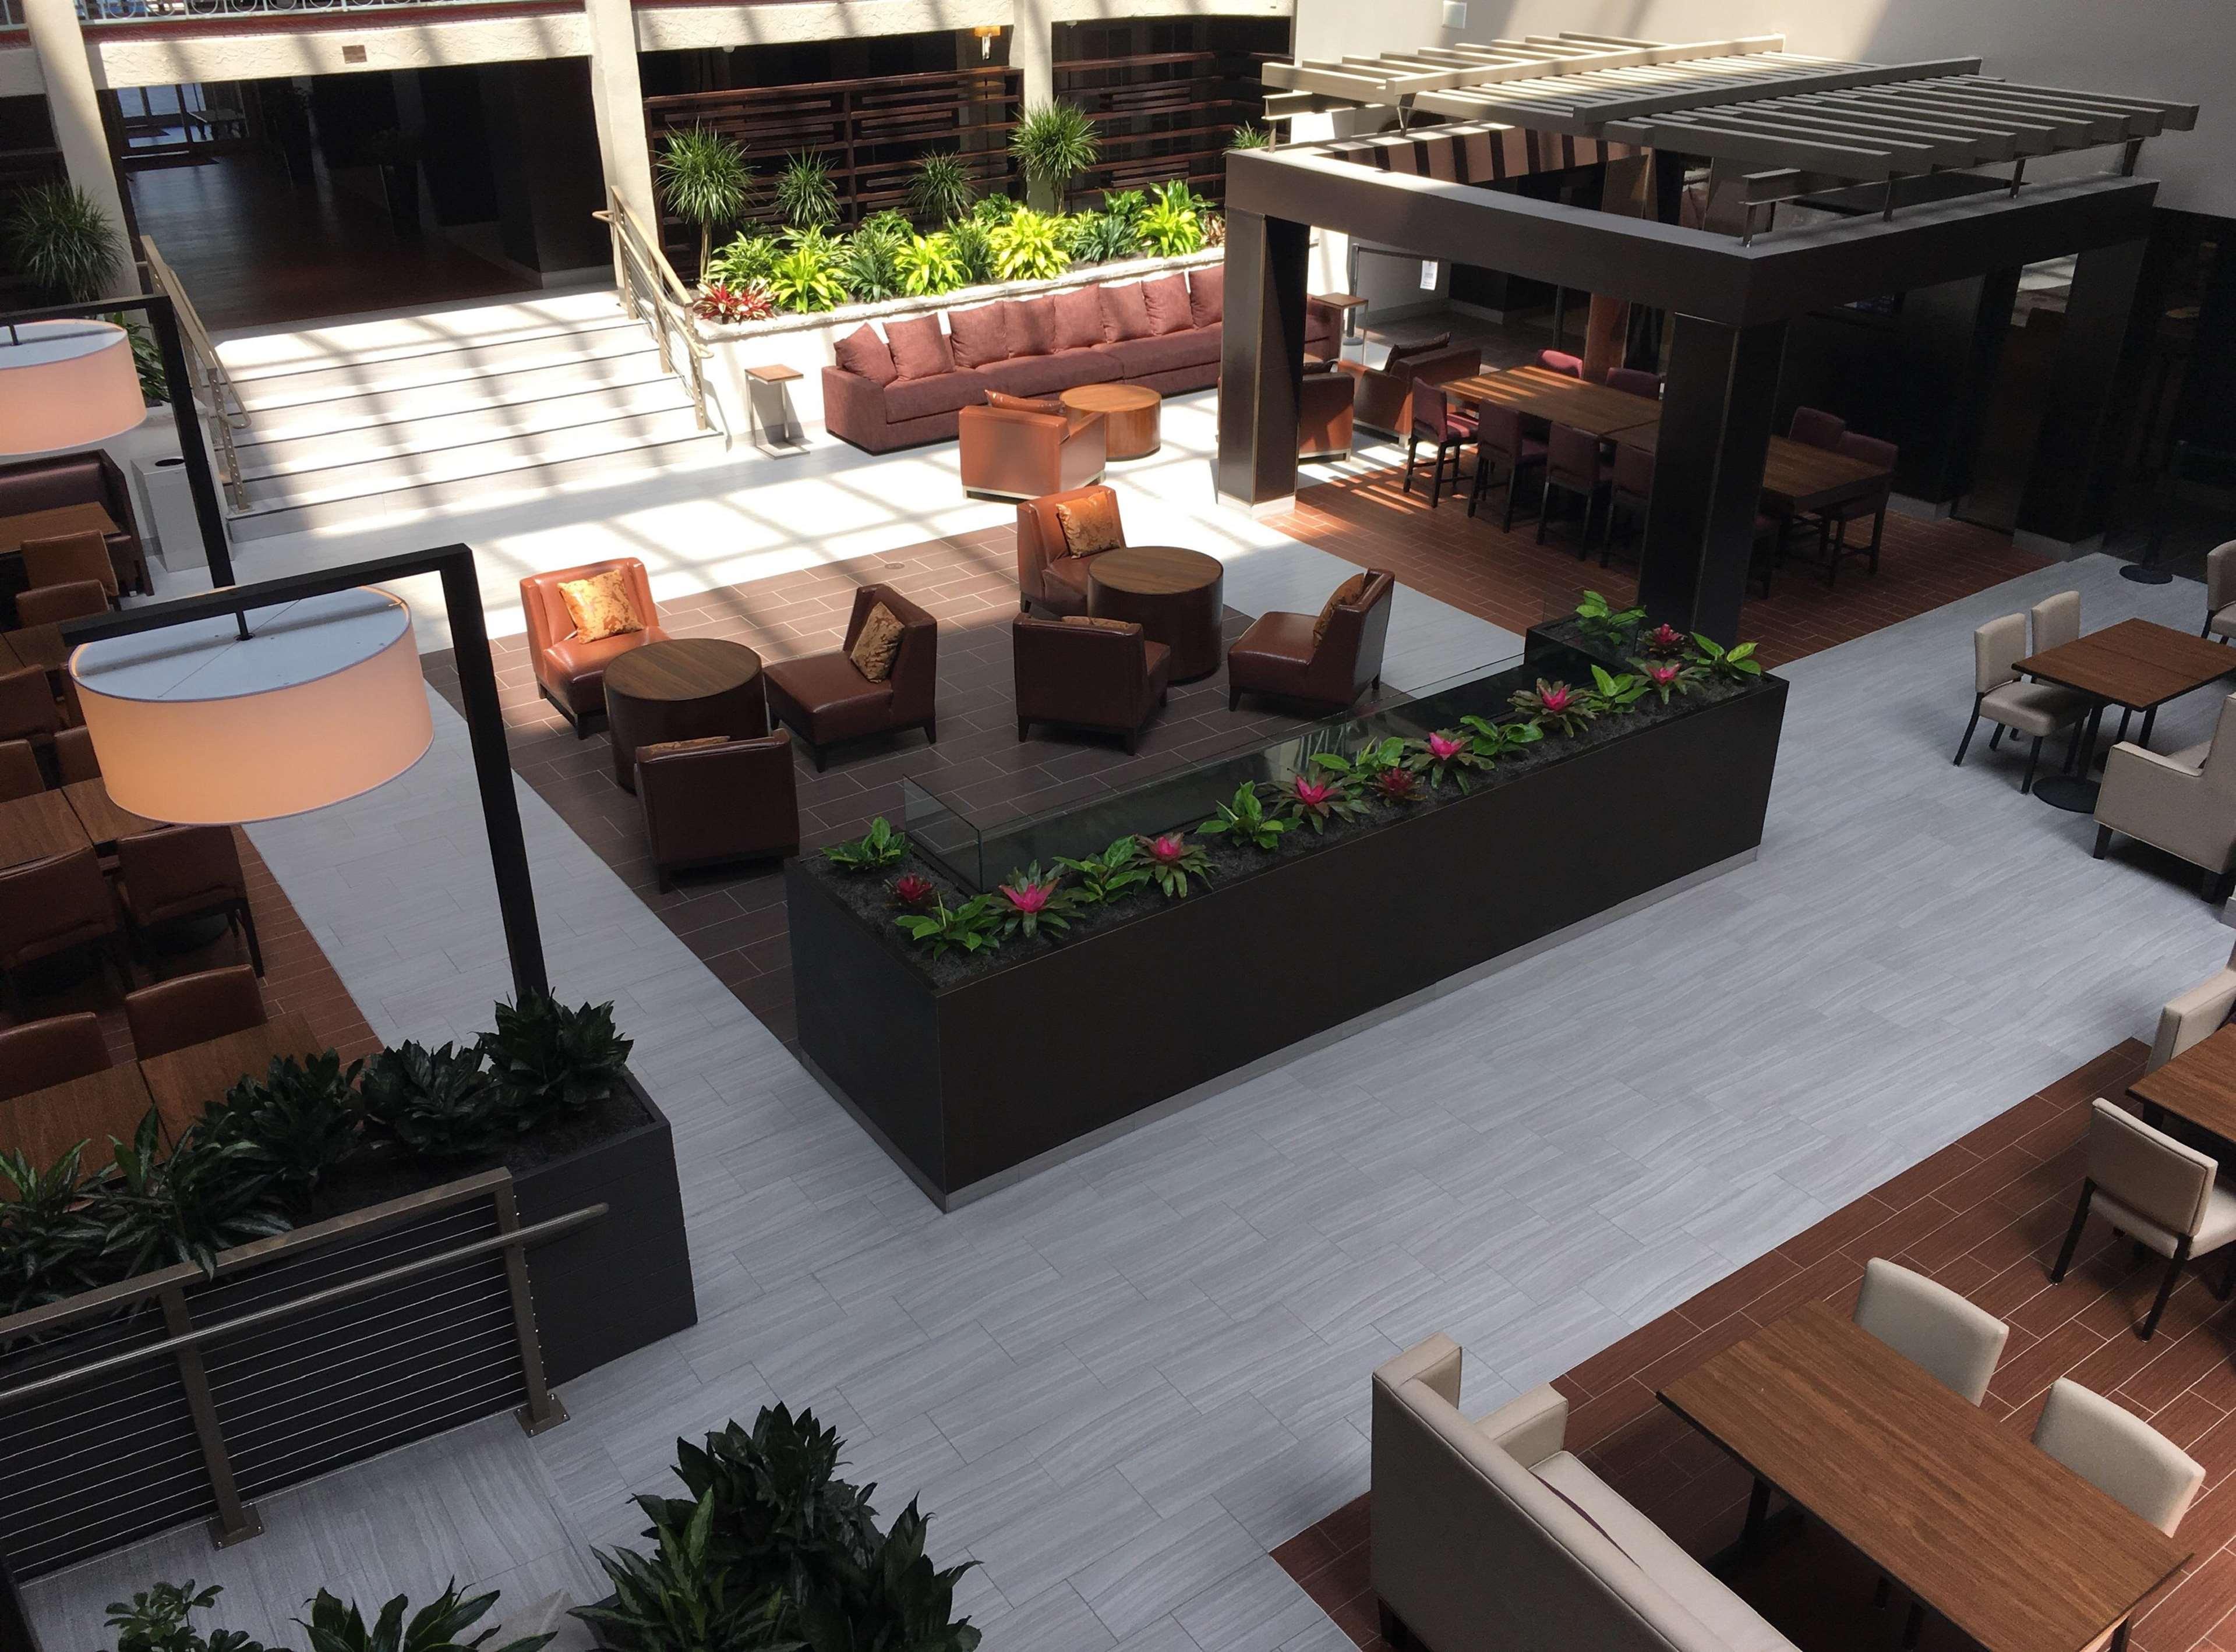 Embassy Suites by Hilton Denver Tech Center North